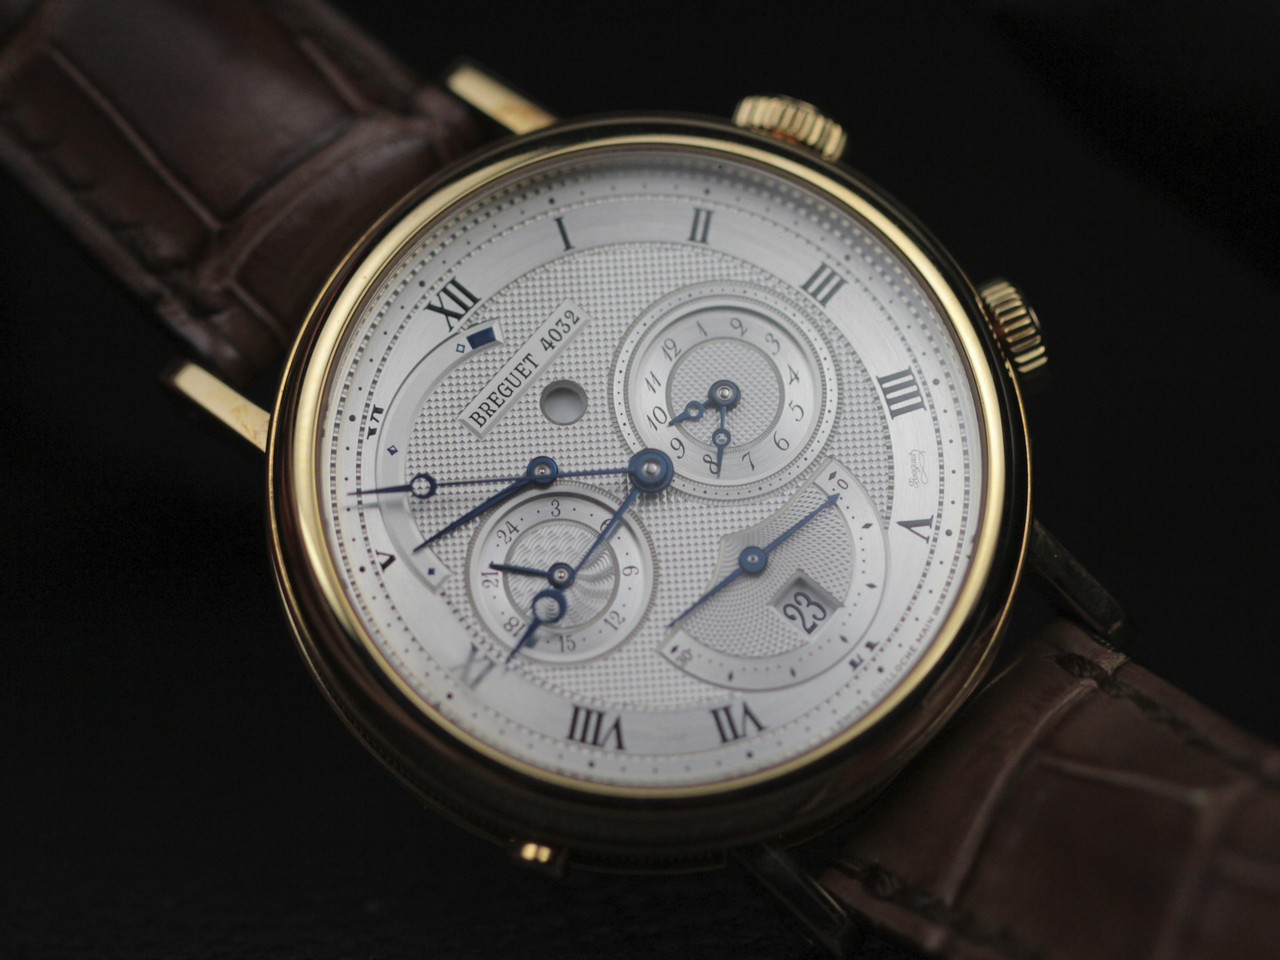 Breguet Watch - Classique GMT Alarm Yellow Gold 5707.BA.12.9V6 - www.Legendoftime.com - Chicago Watch Center